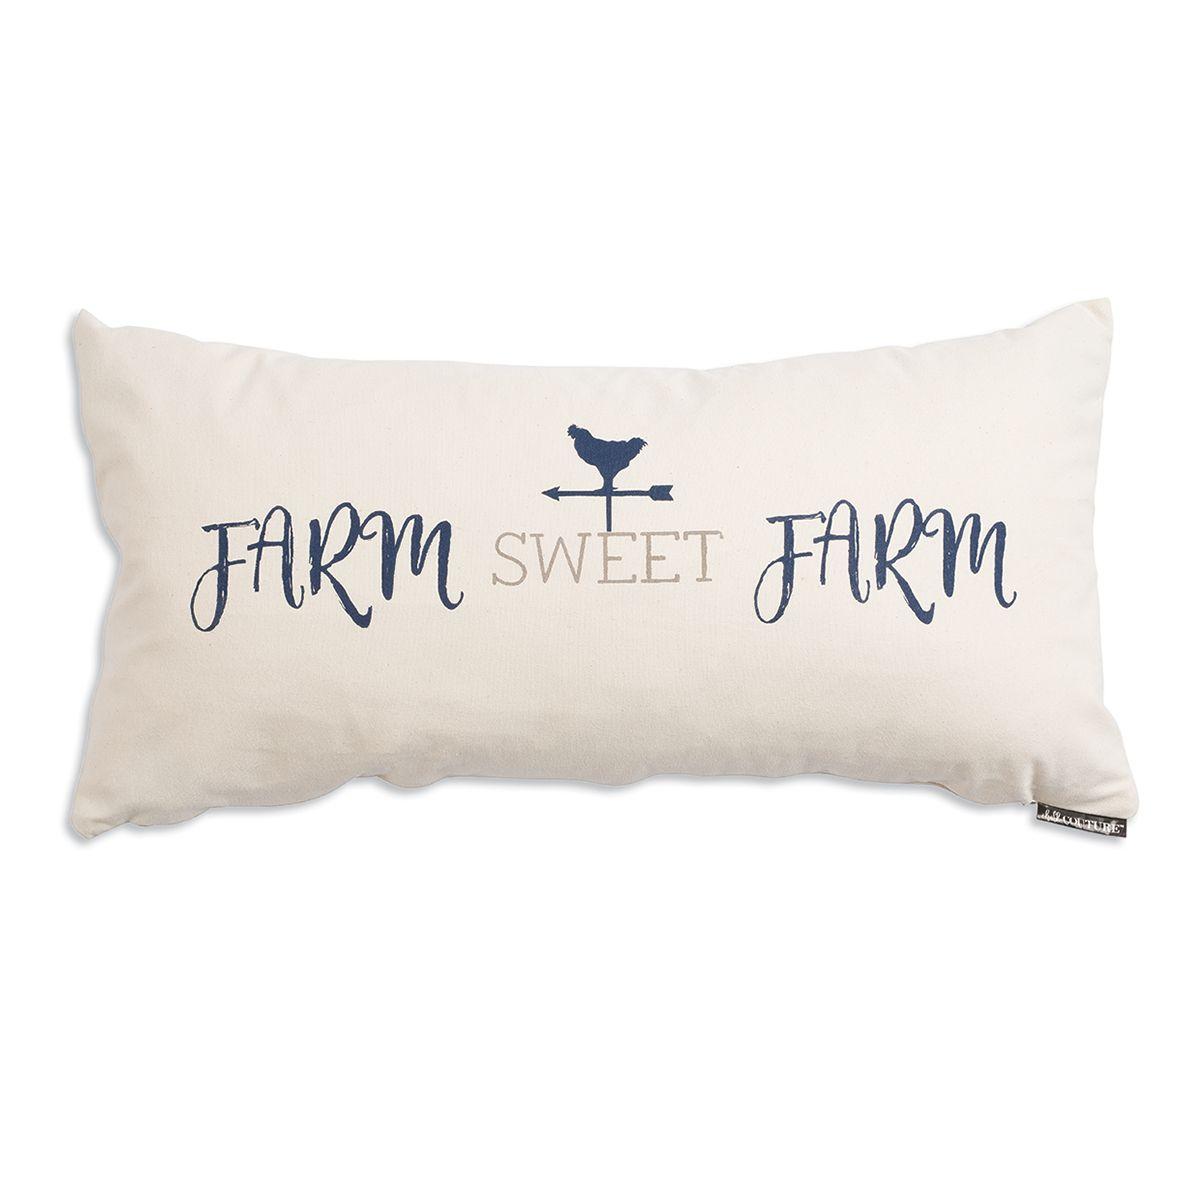 FARM SWEET FARM new small Burlap decor pillow